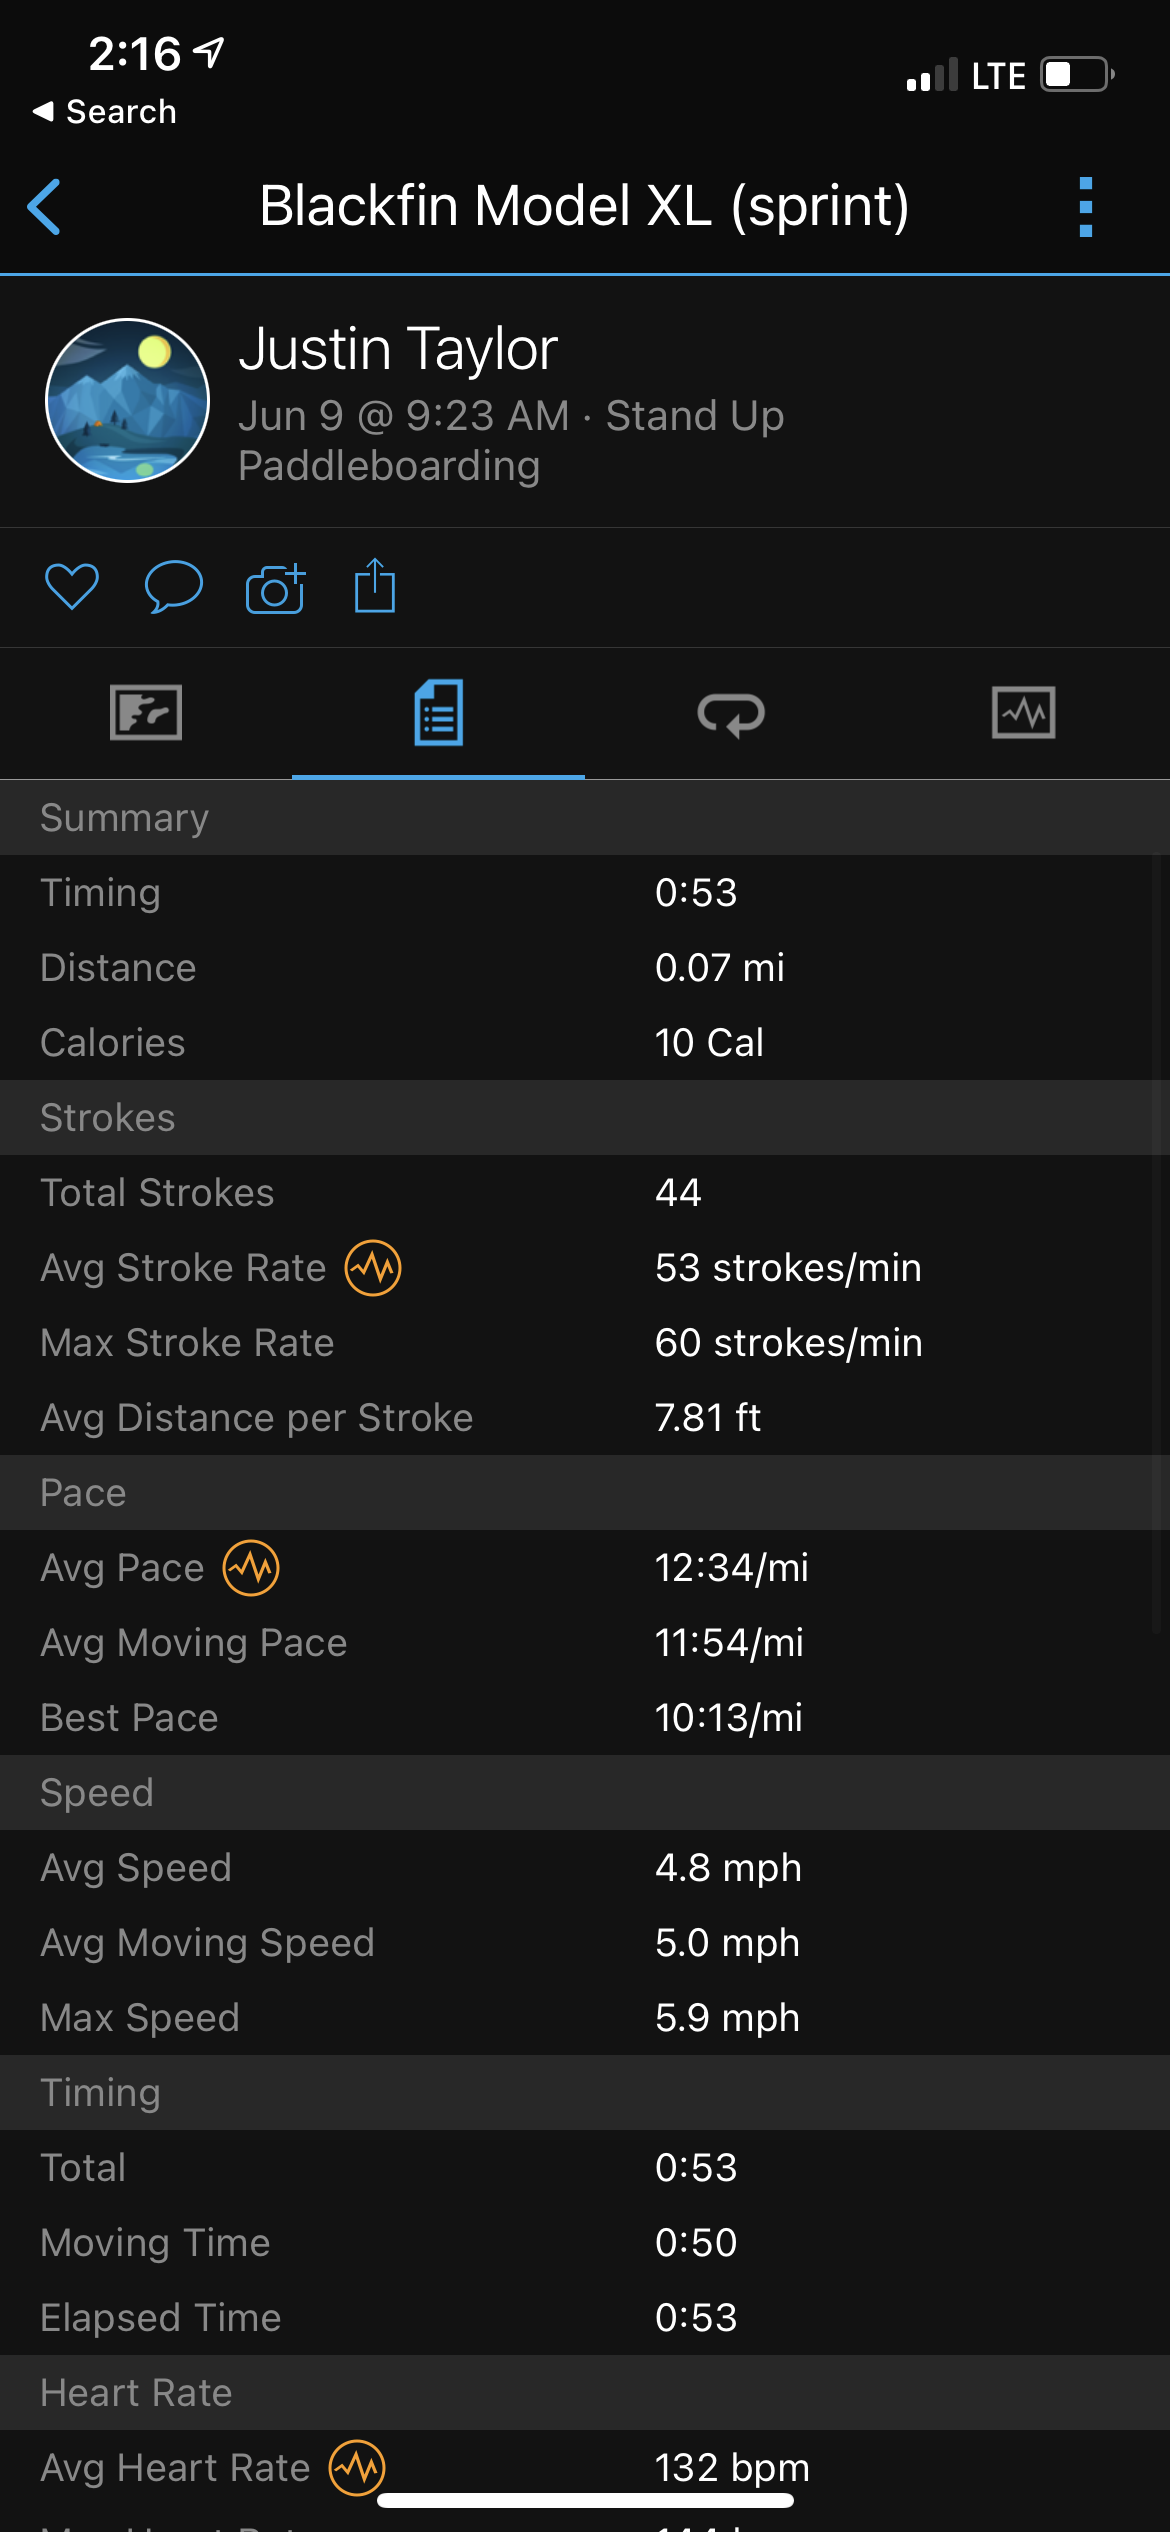 Blackfin Model XL sprint test